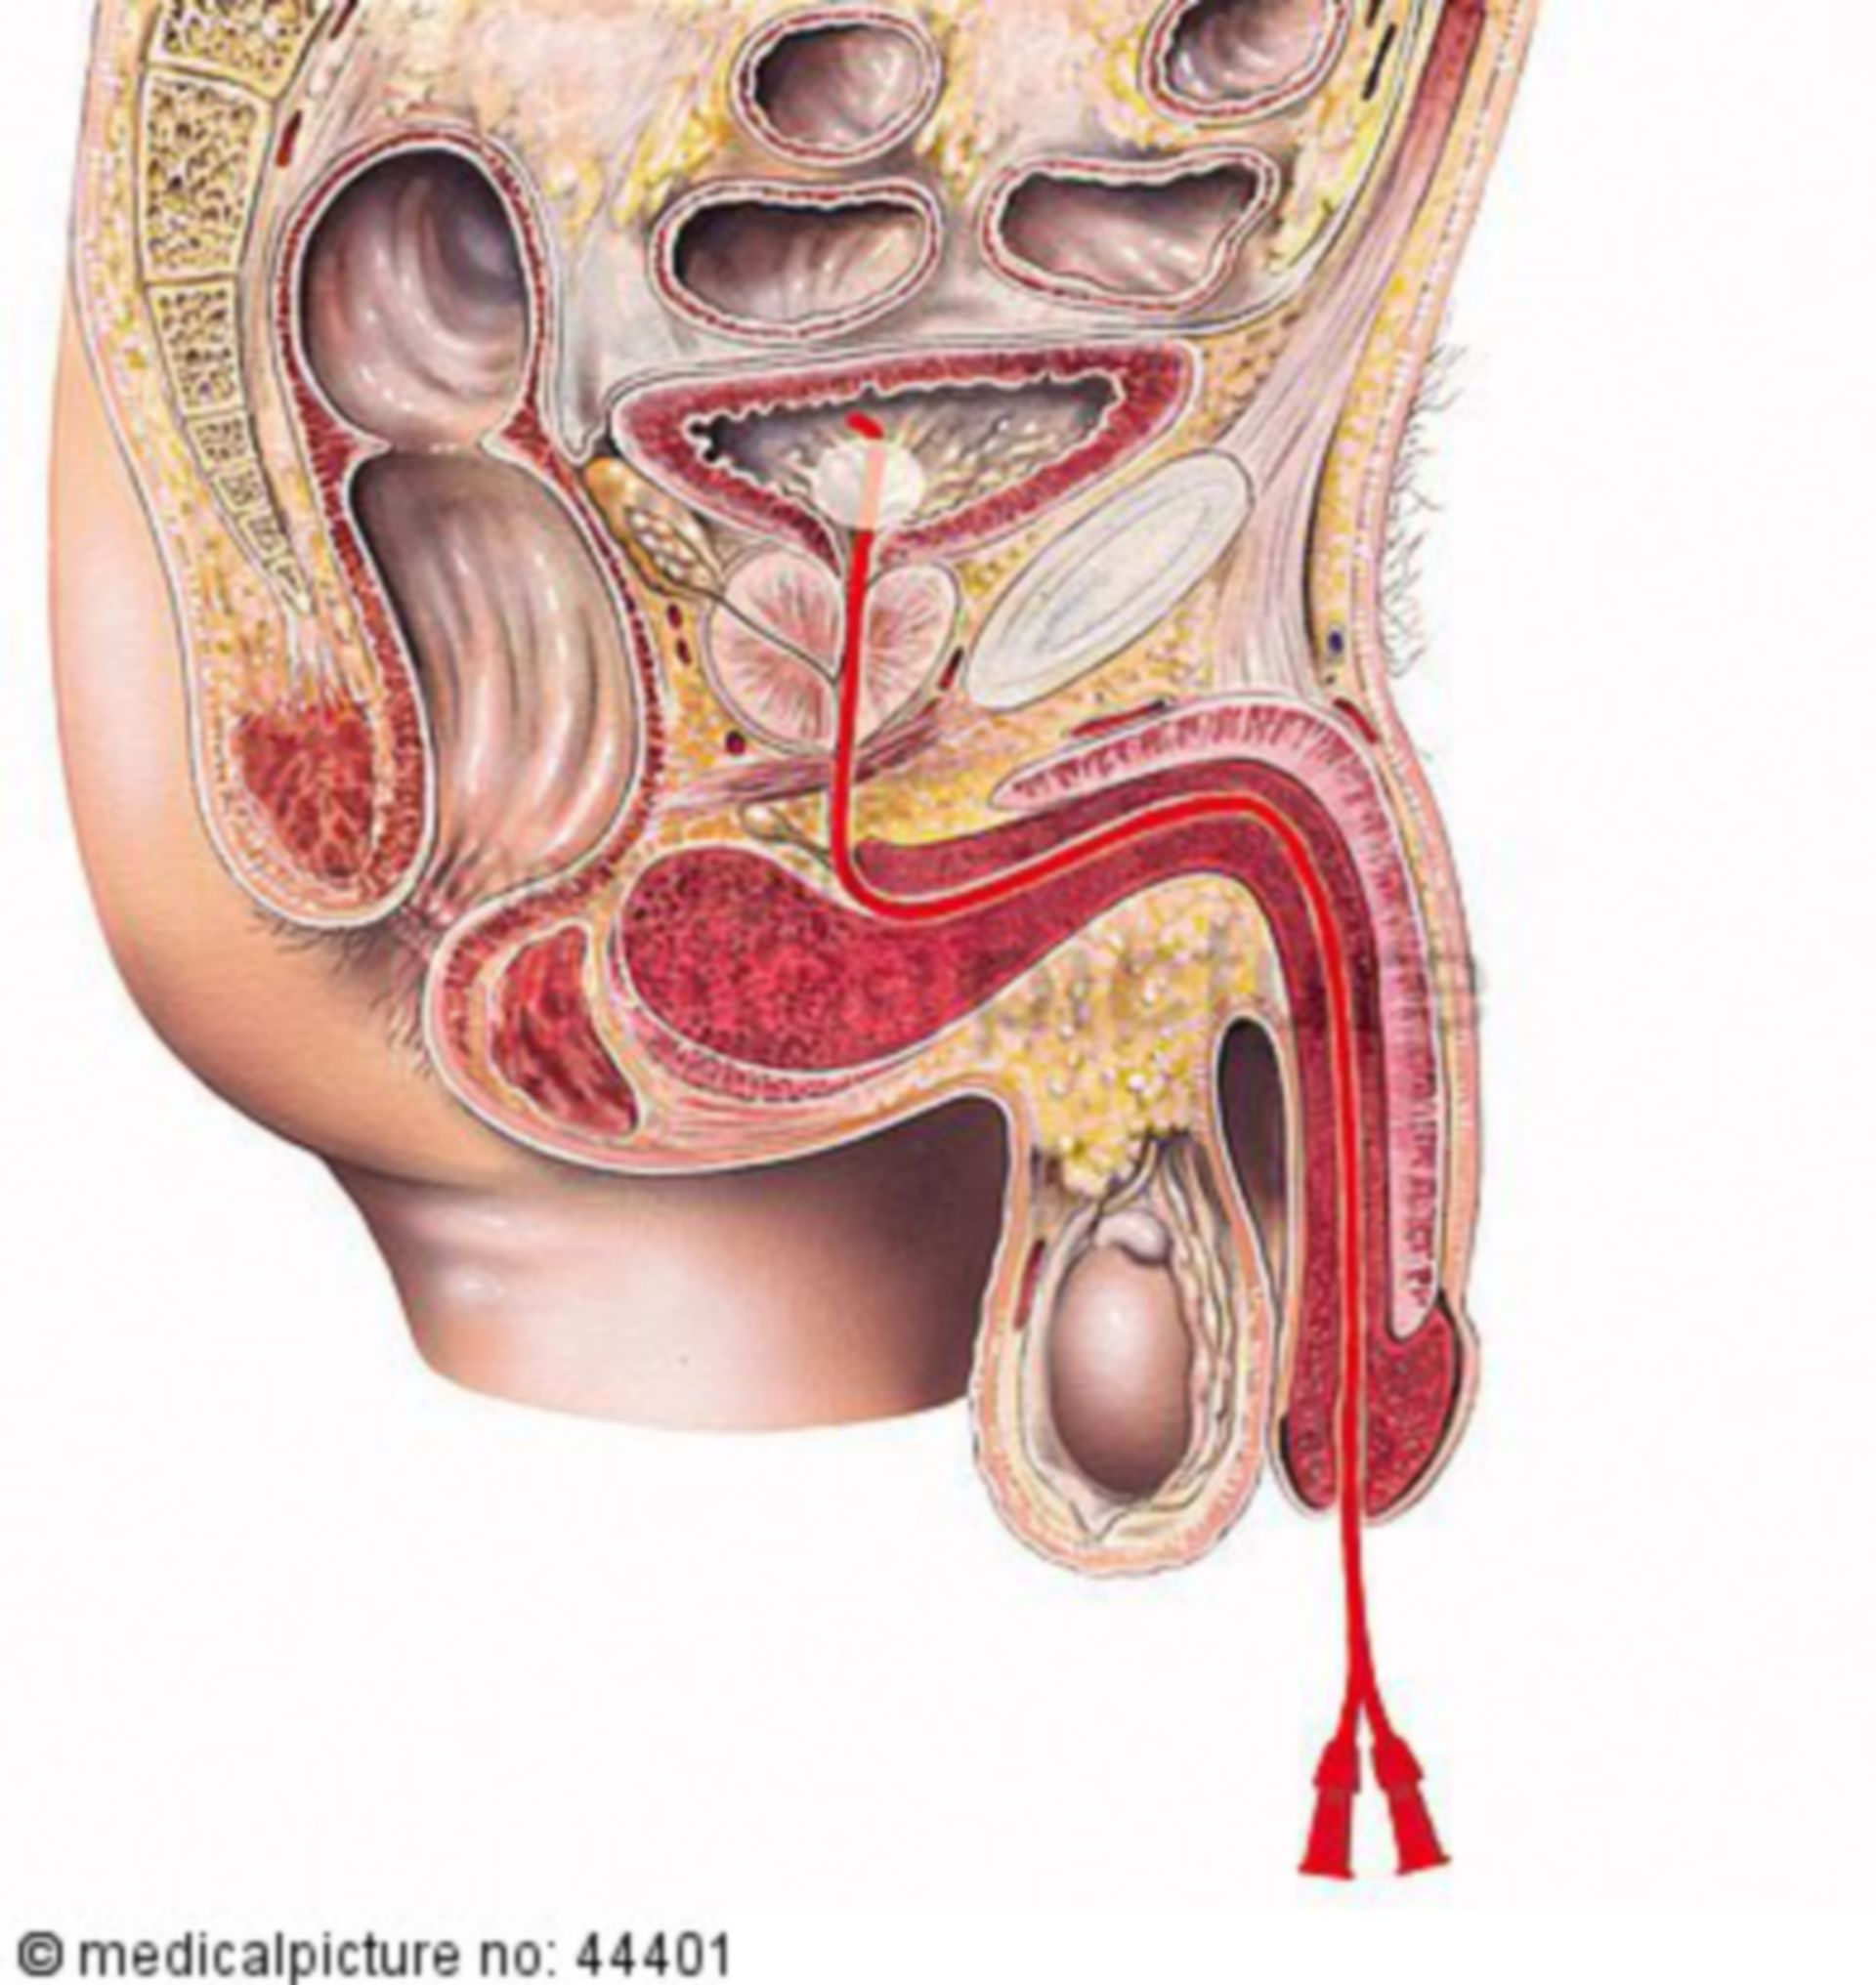 Male urinary catheter